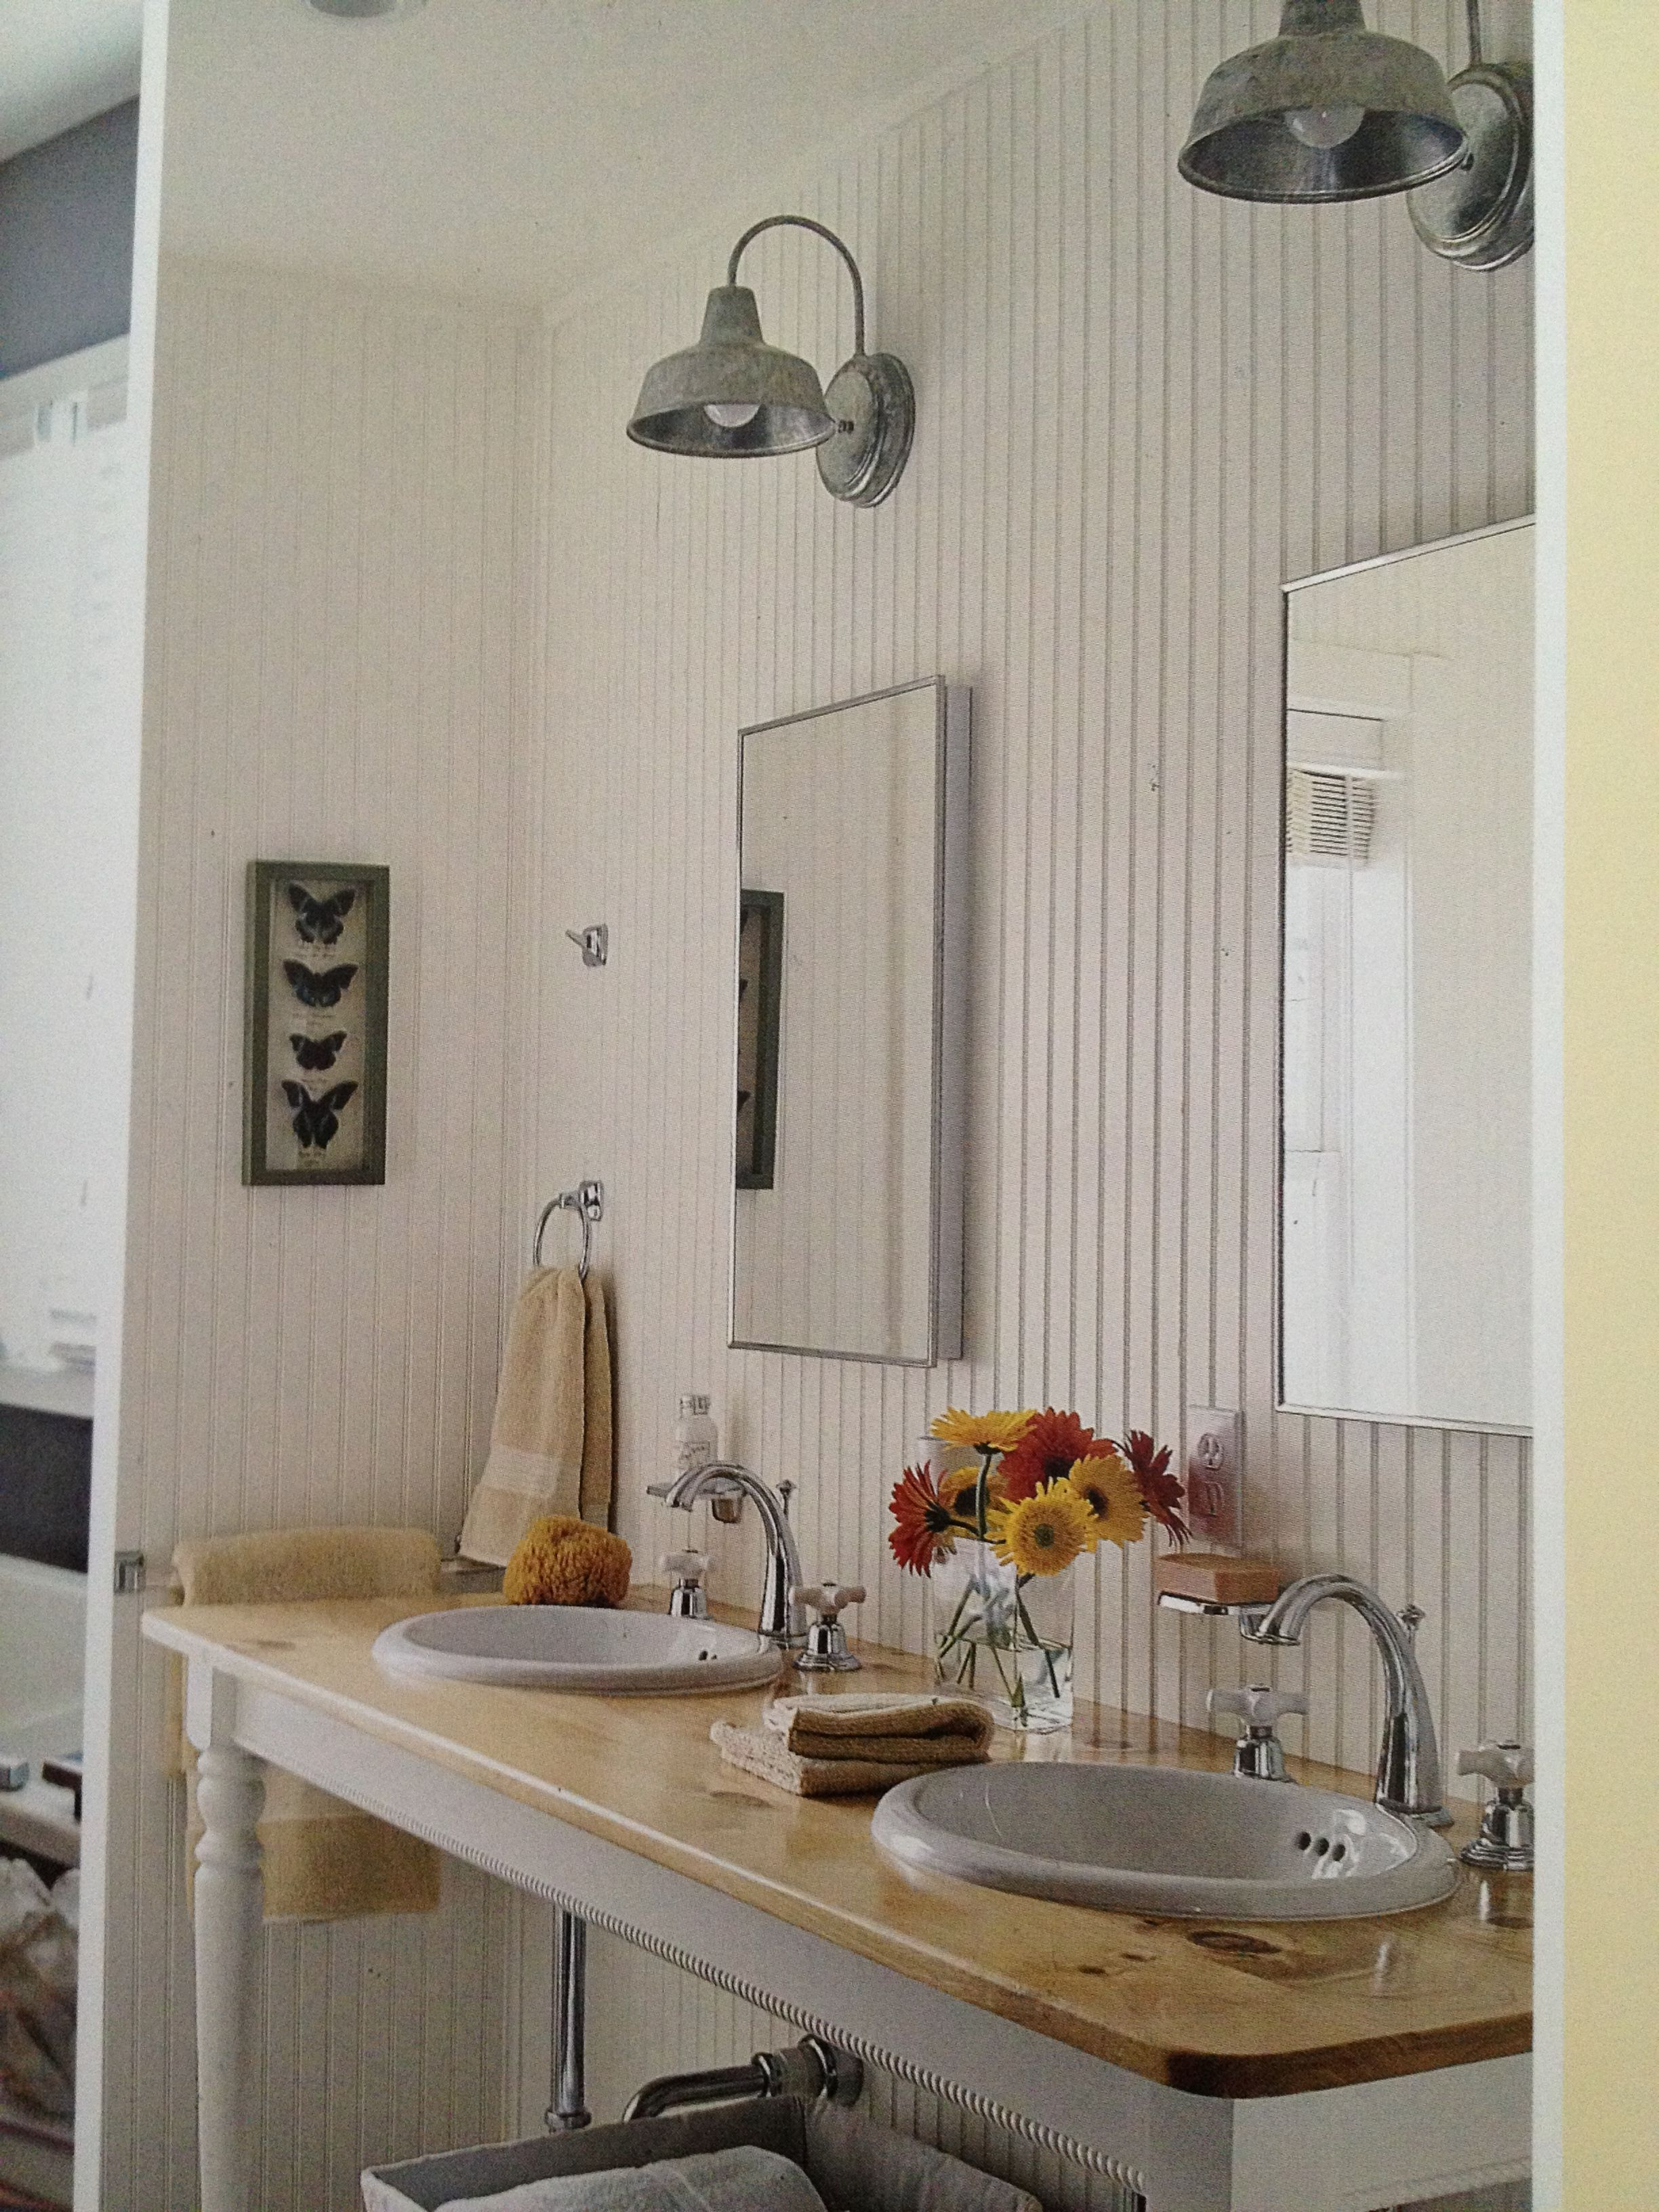 barn lights and sideboard as vanity light fixtures pinterest rh pinterest com